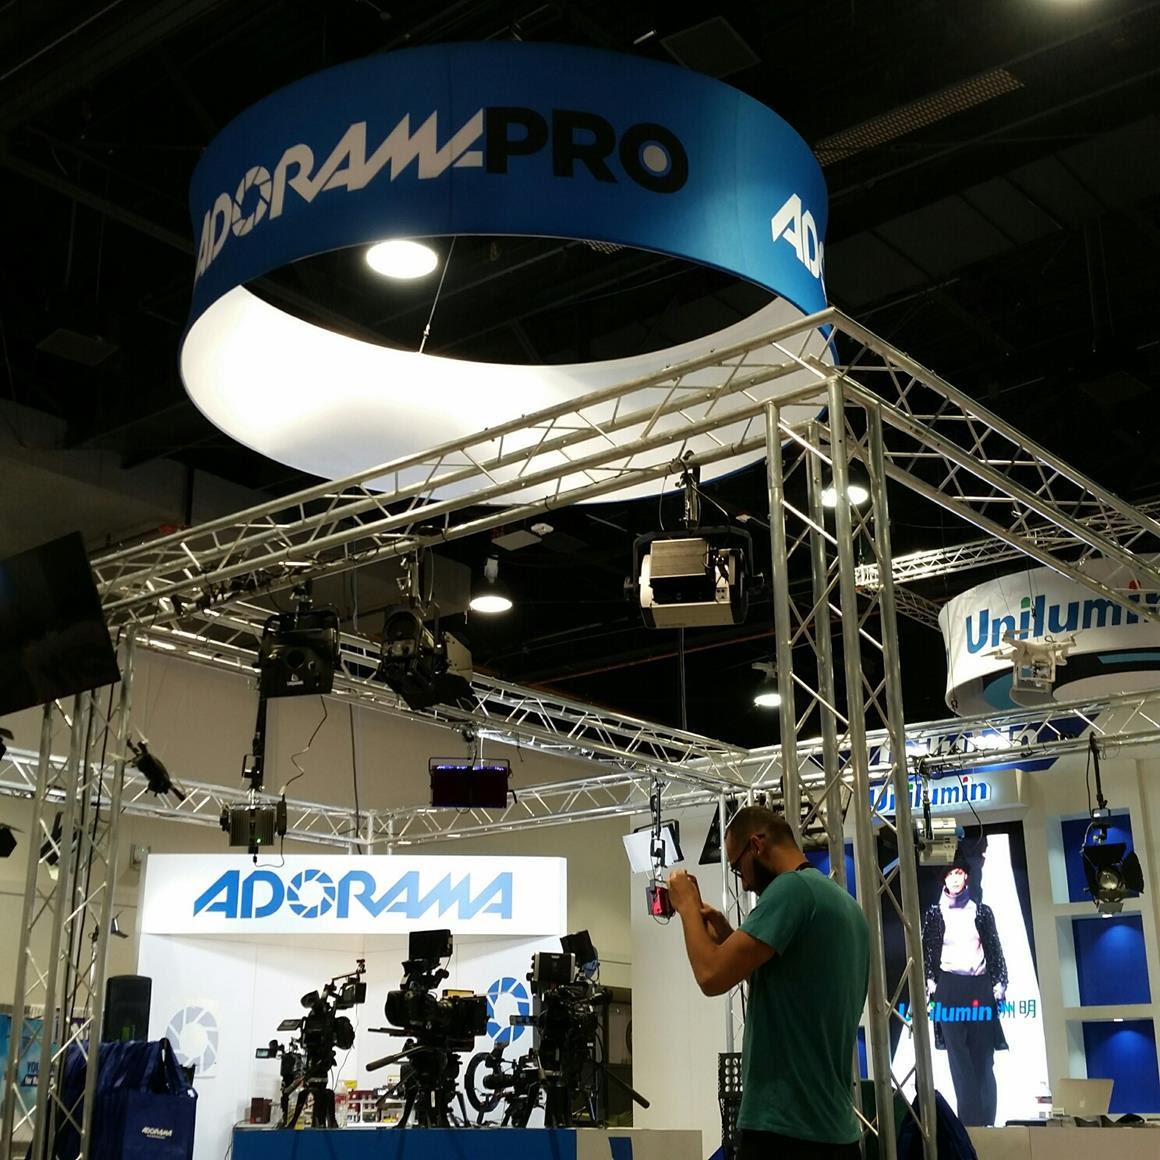 Adorama-nab 2017 | Technology News 2017